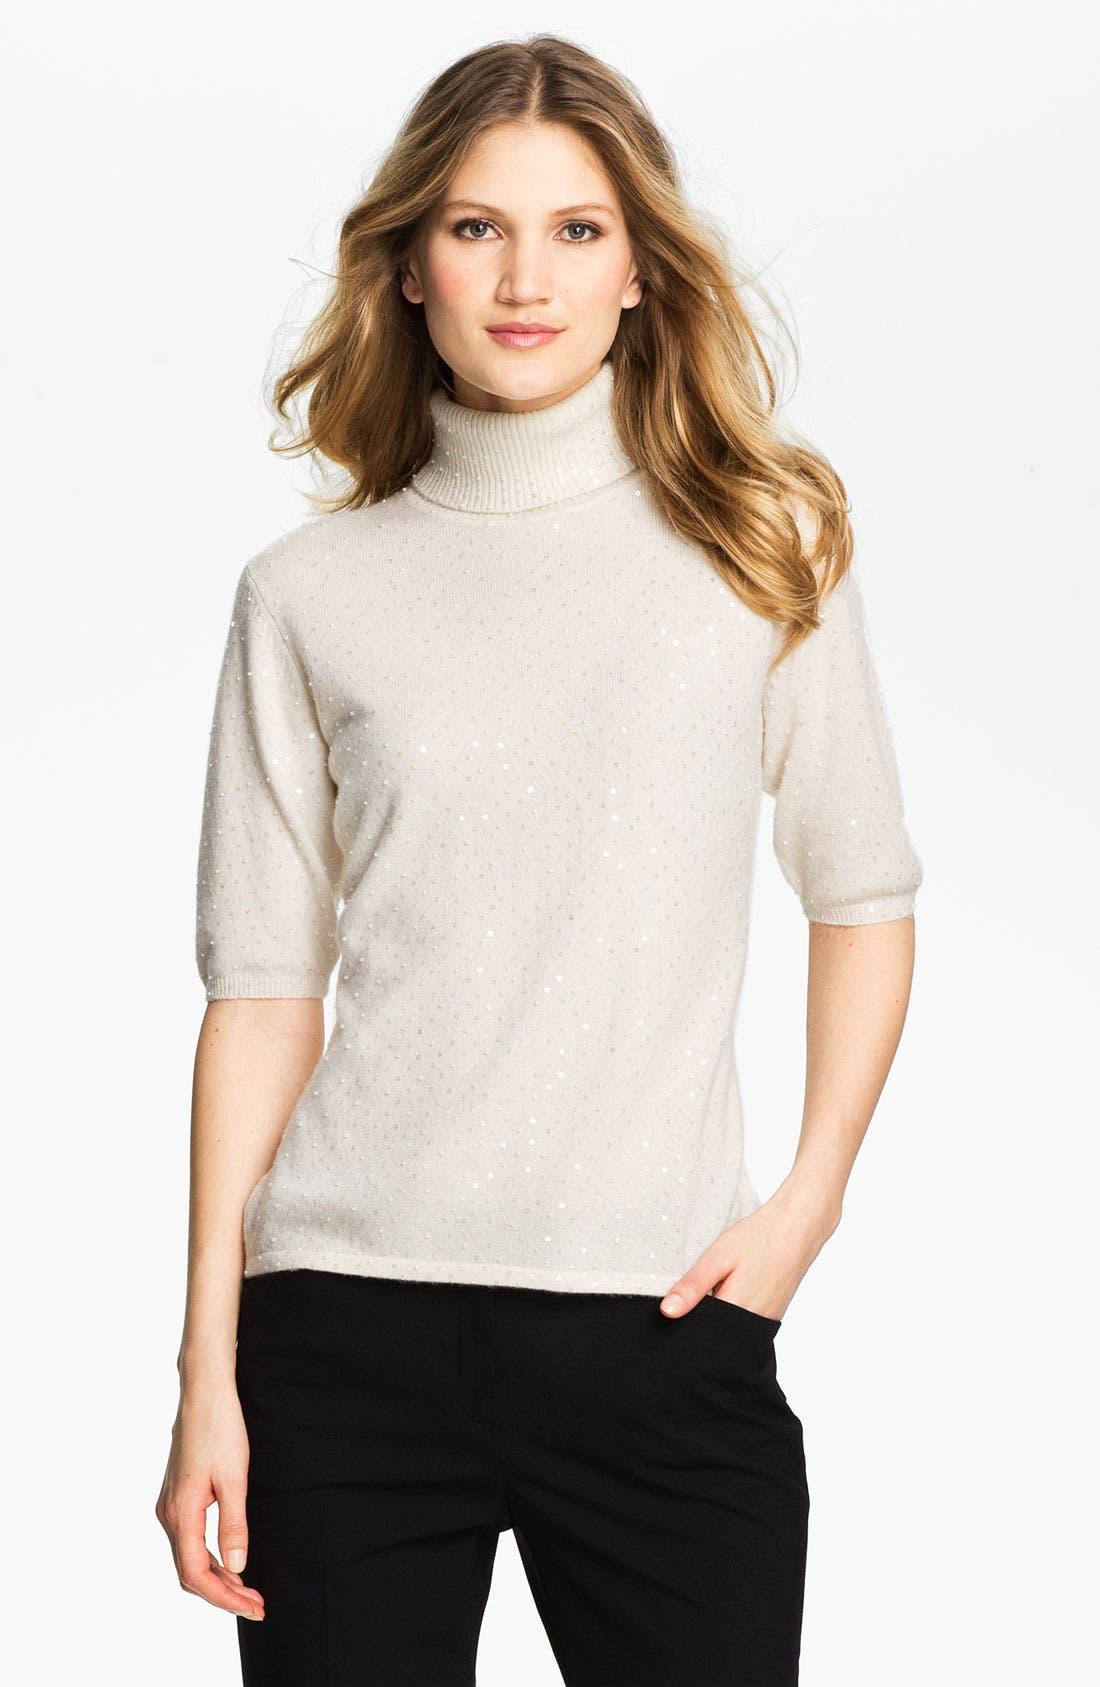 Main Image - Pure Amici Embellished Cashmere Turtleneck Sweater